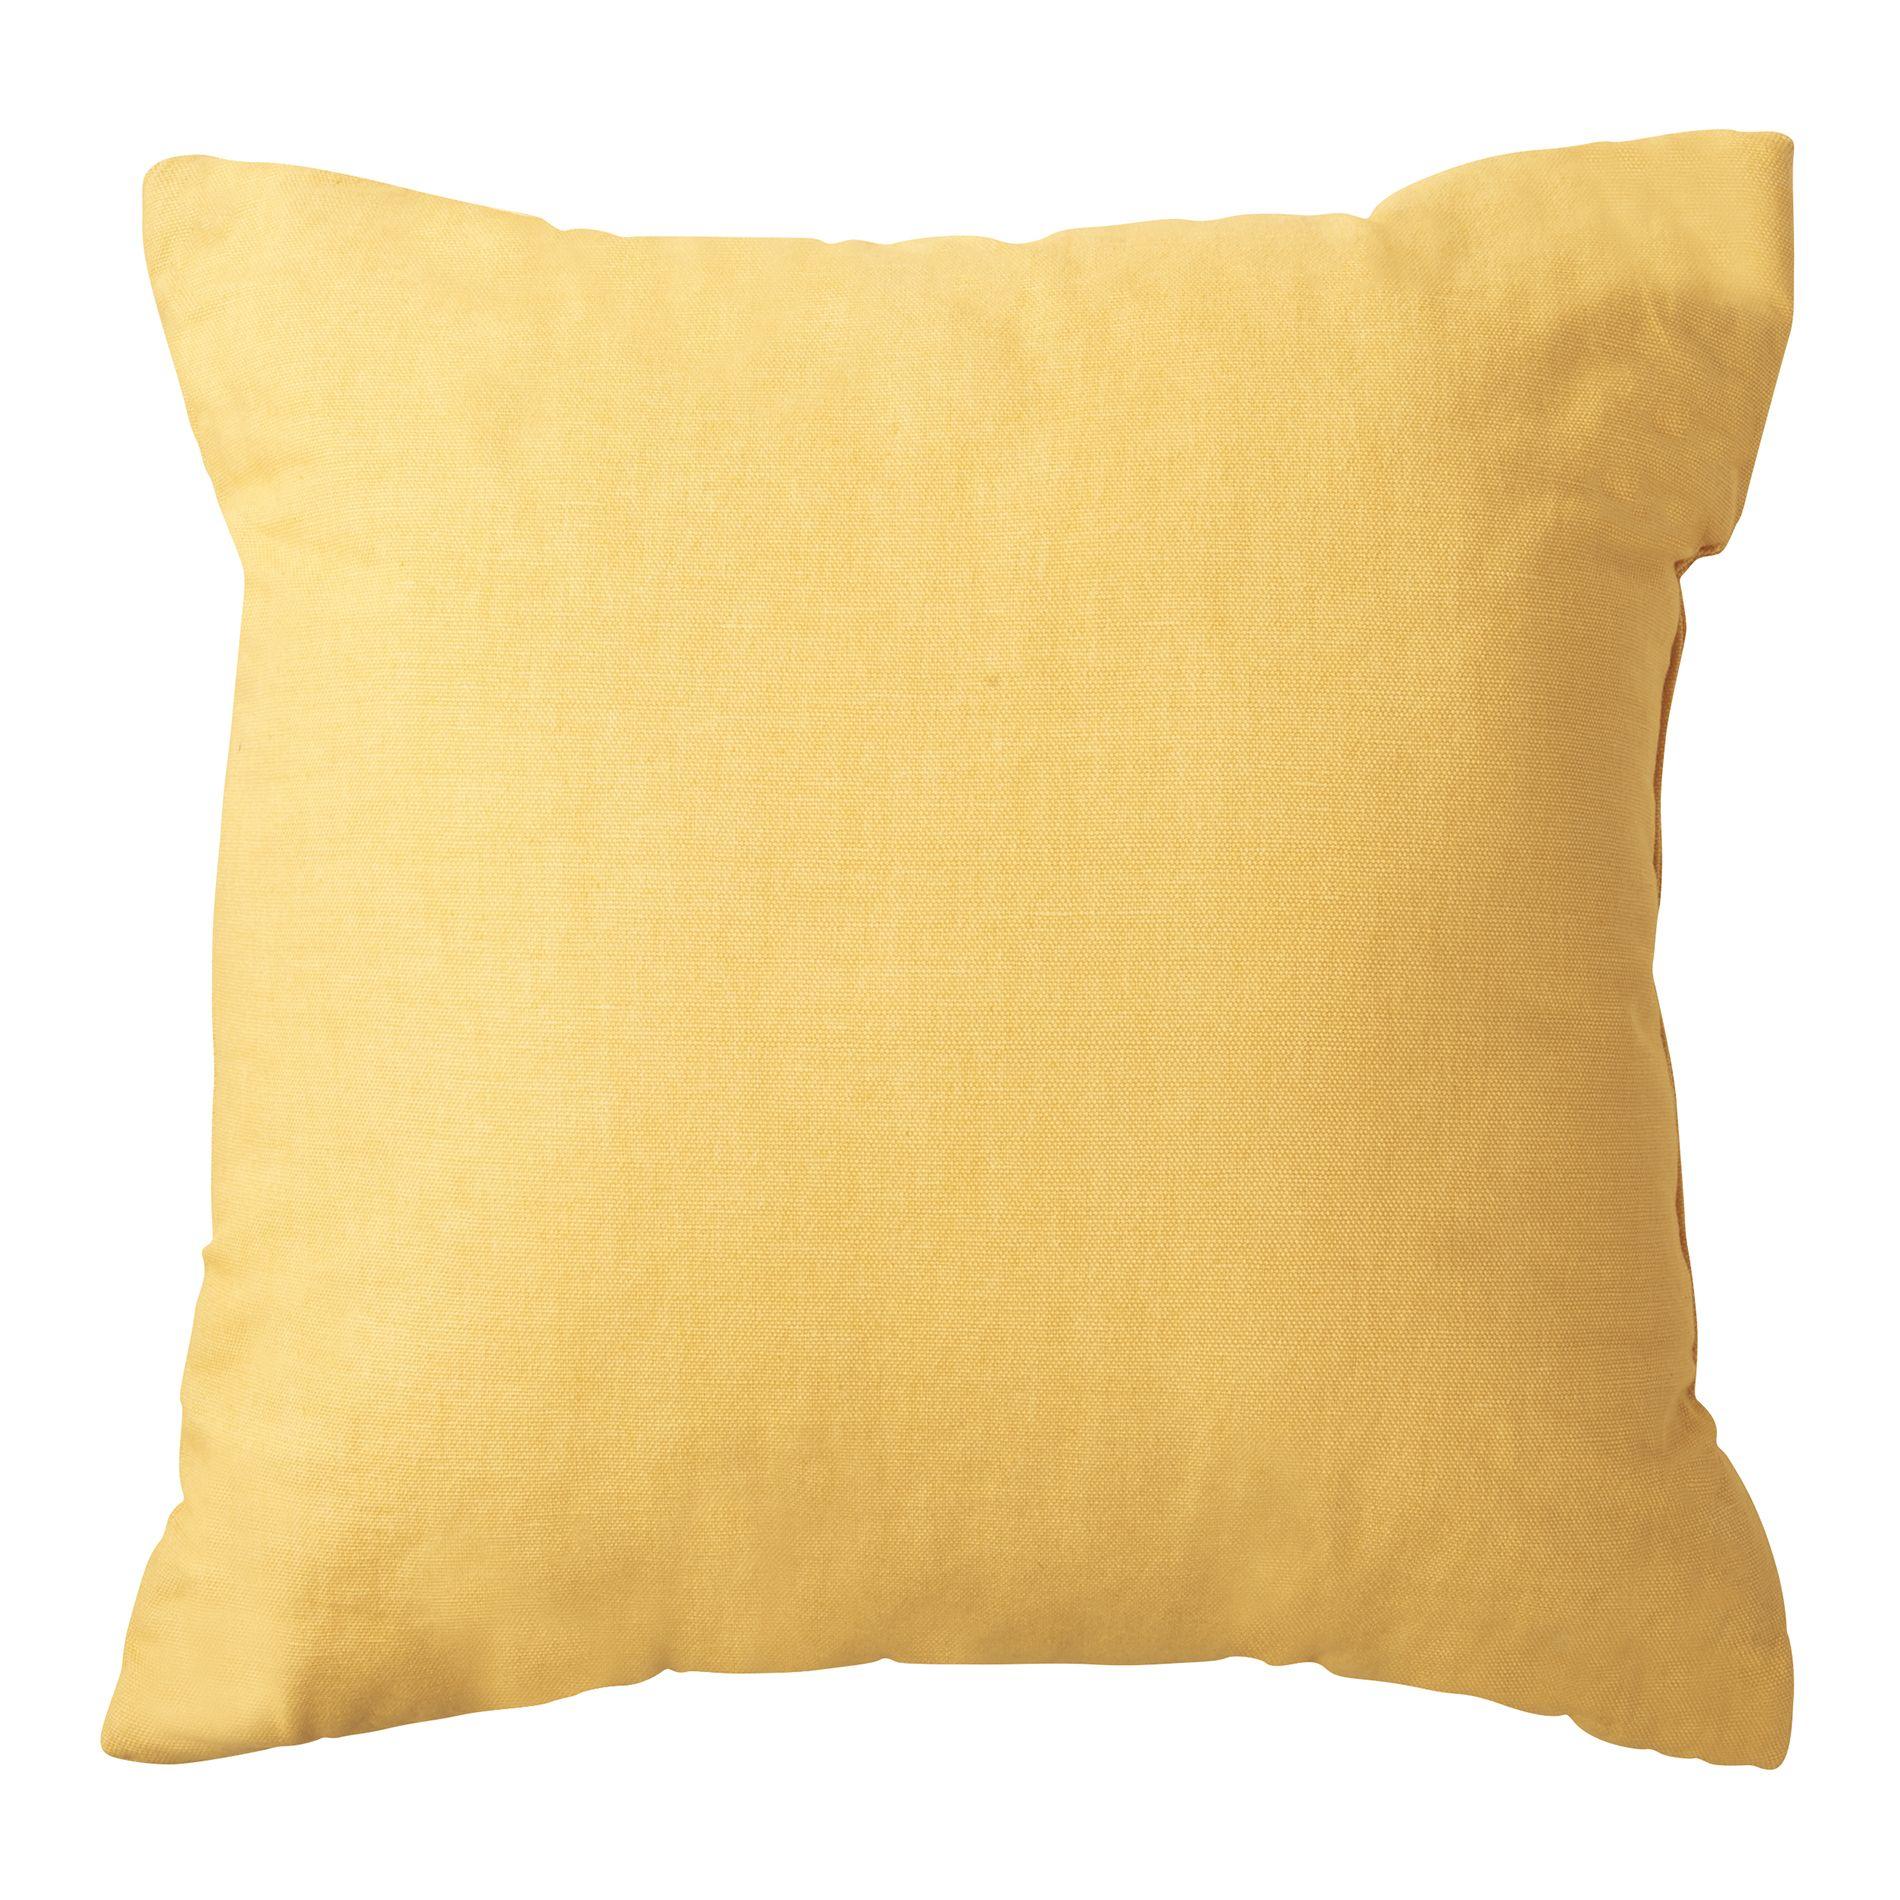 Kmart 10 Yellow pillows, Pillows, Front porch